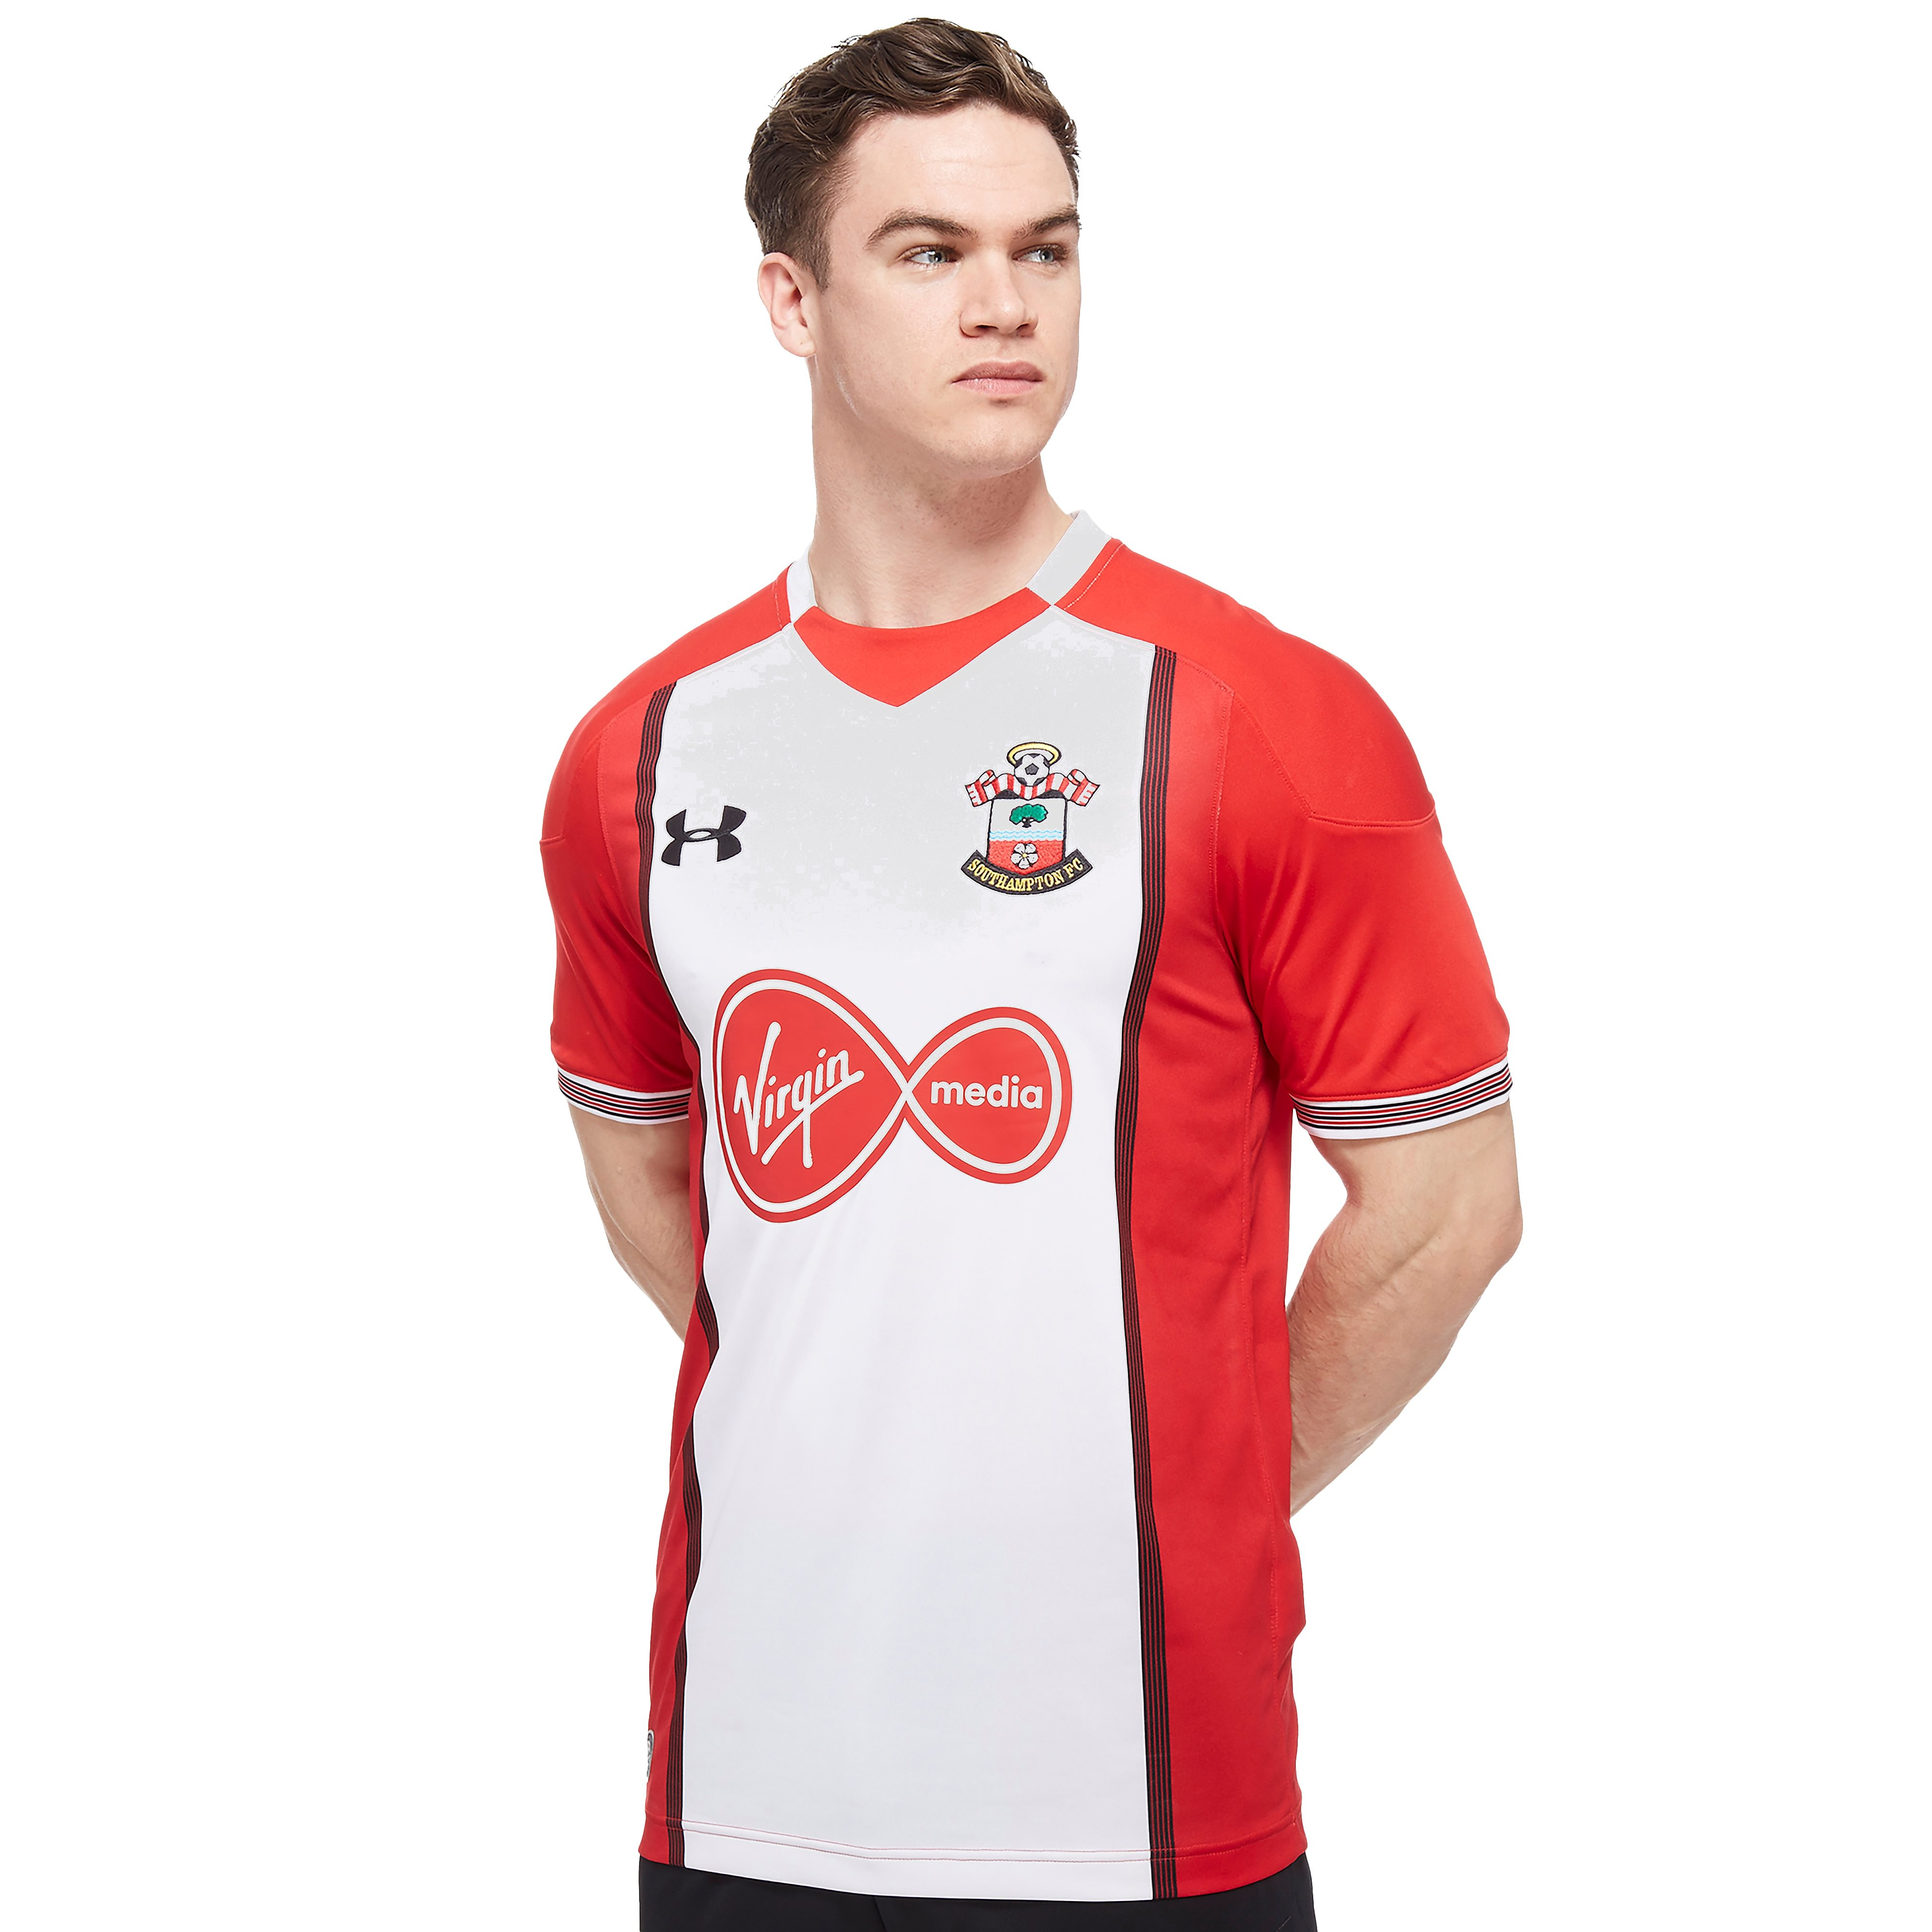 Under Armour Southampton FC 2017/18 Men's Home Shirt